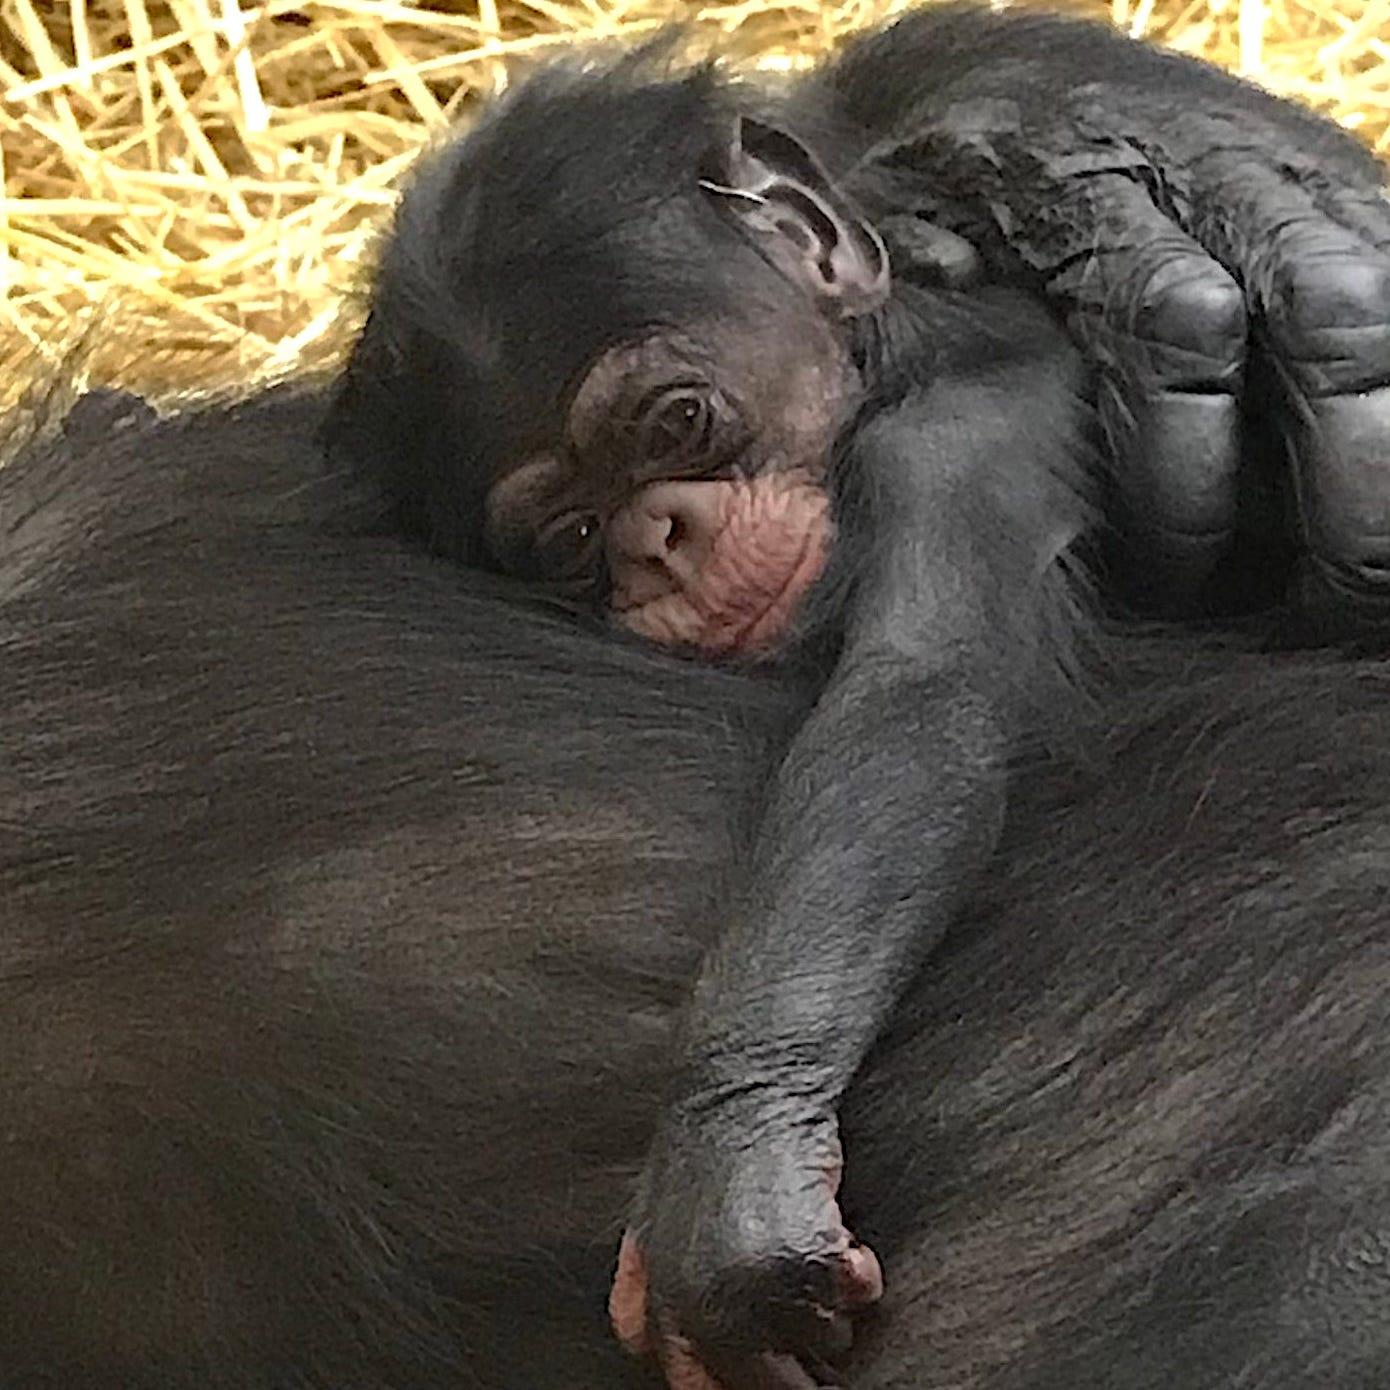 Baby chimpanzee born at Detroit Zoo on World Chimpanzee Day